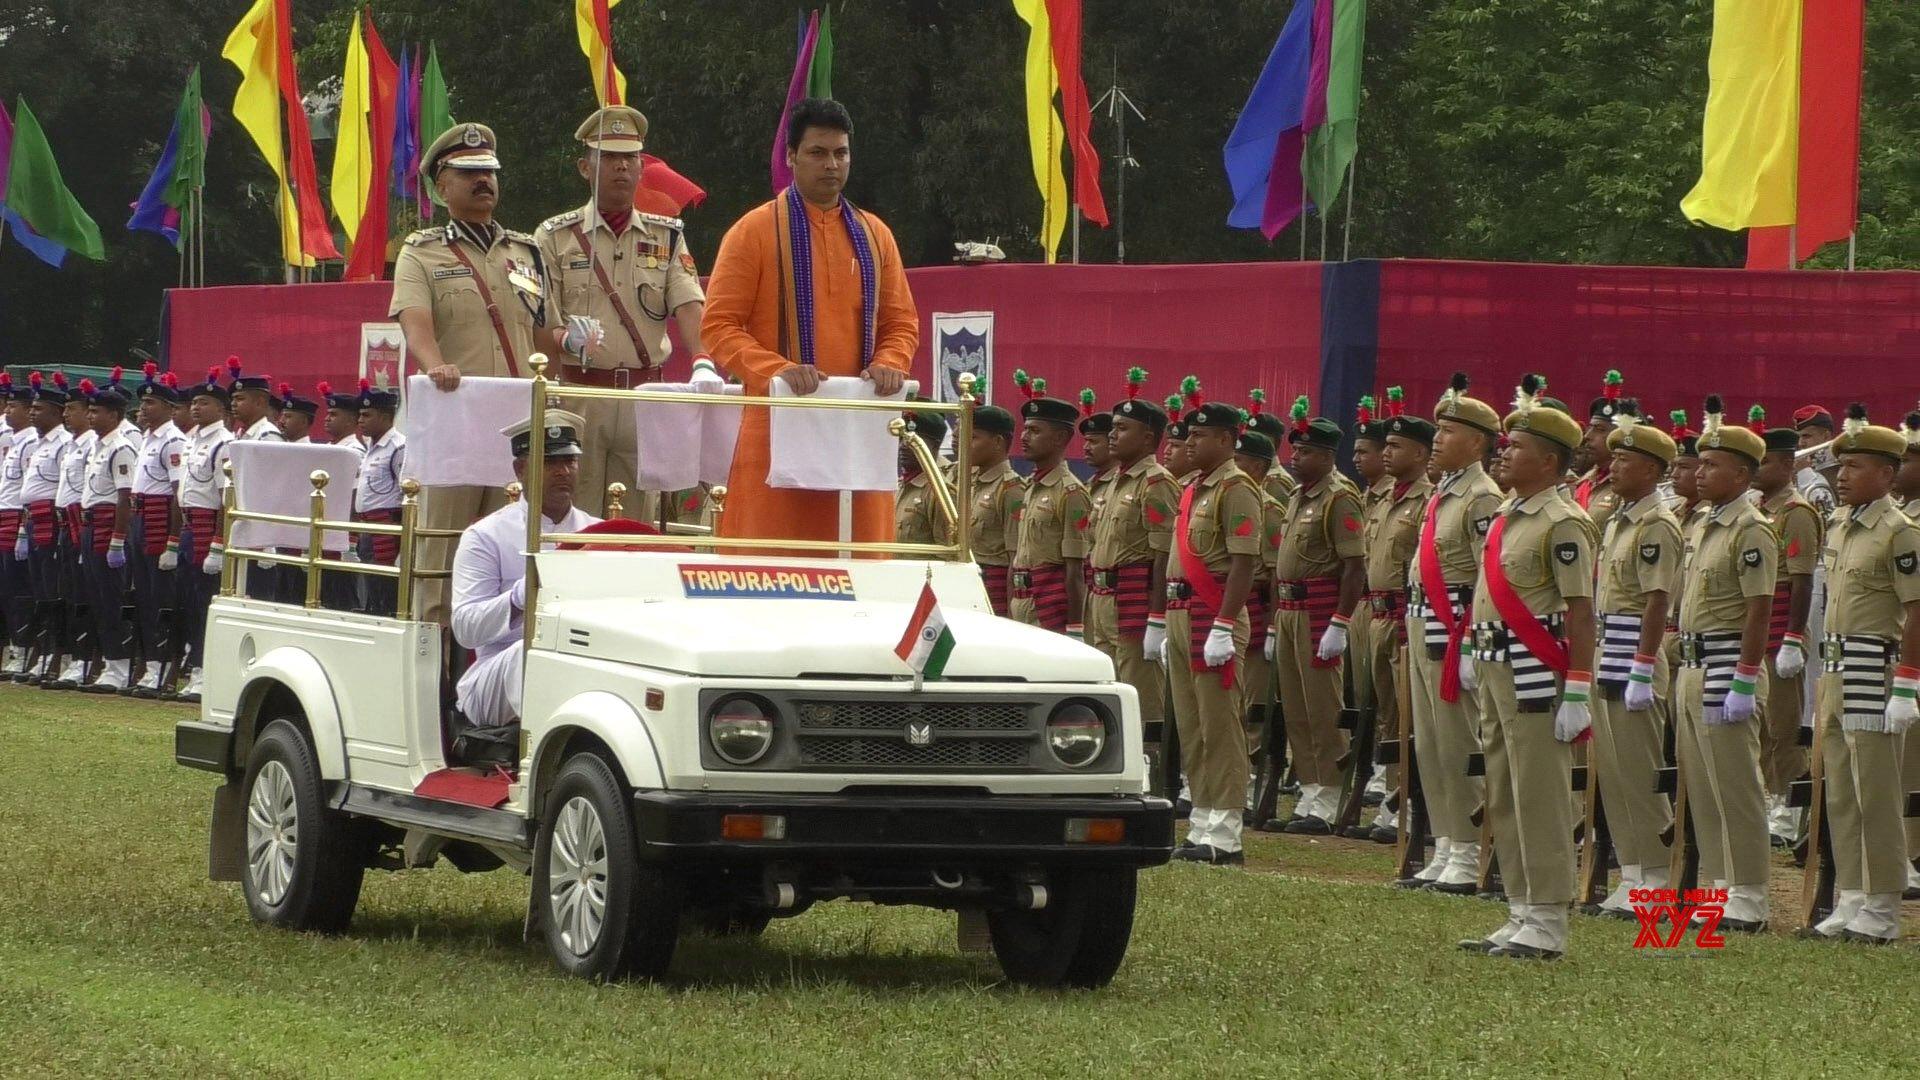 Agartala: Biplab Kumar Deb during 73rd Independence Day celebrations in Tripura #Gallery